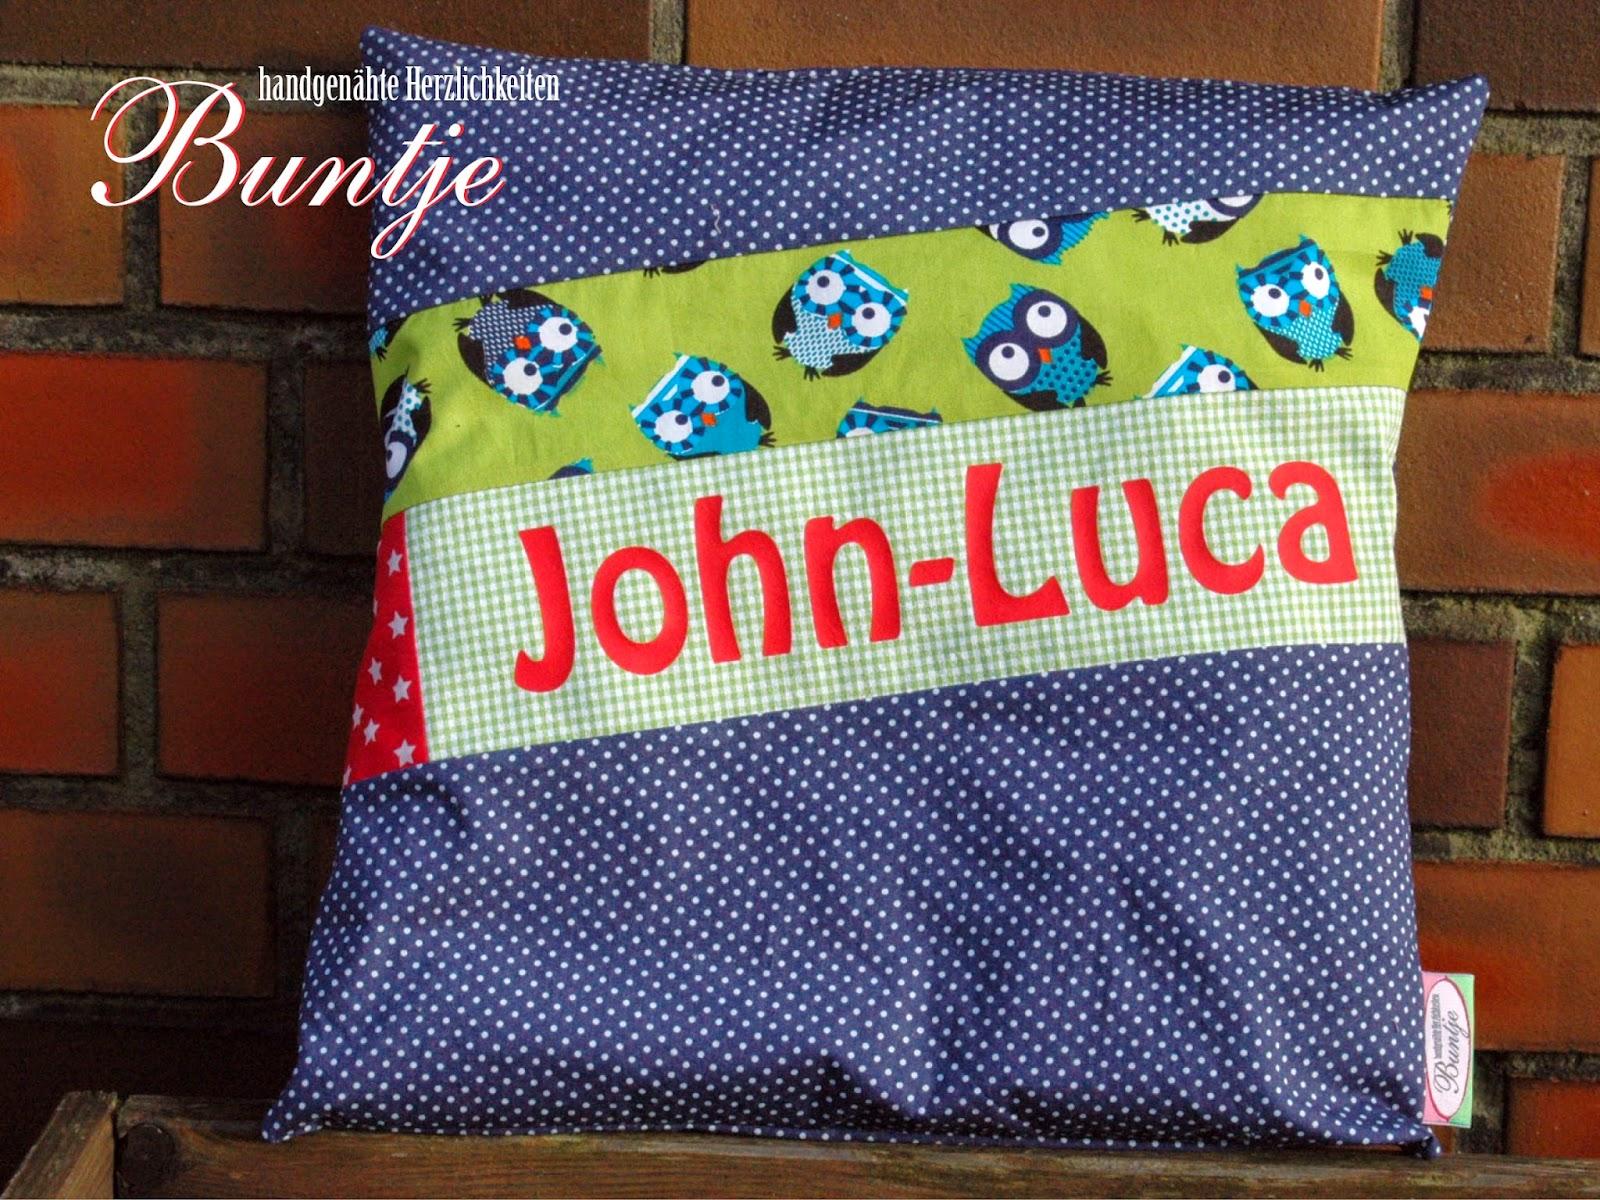 Namenskissen Kissen Name Geschenk Kind Baby Geburt Taufe 1. Geburtstag Baumwolle Junge blau grün rot Eulen John-Luca handmade nähen Buntje